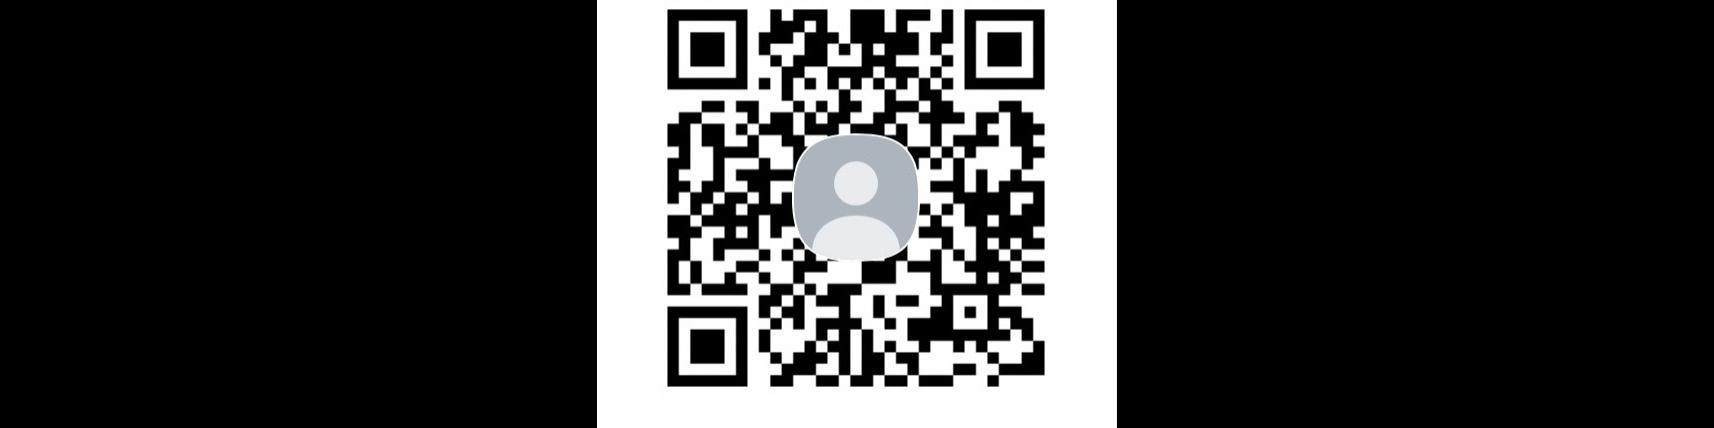 user-background-img